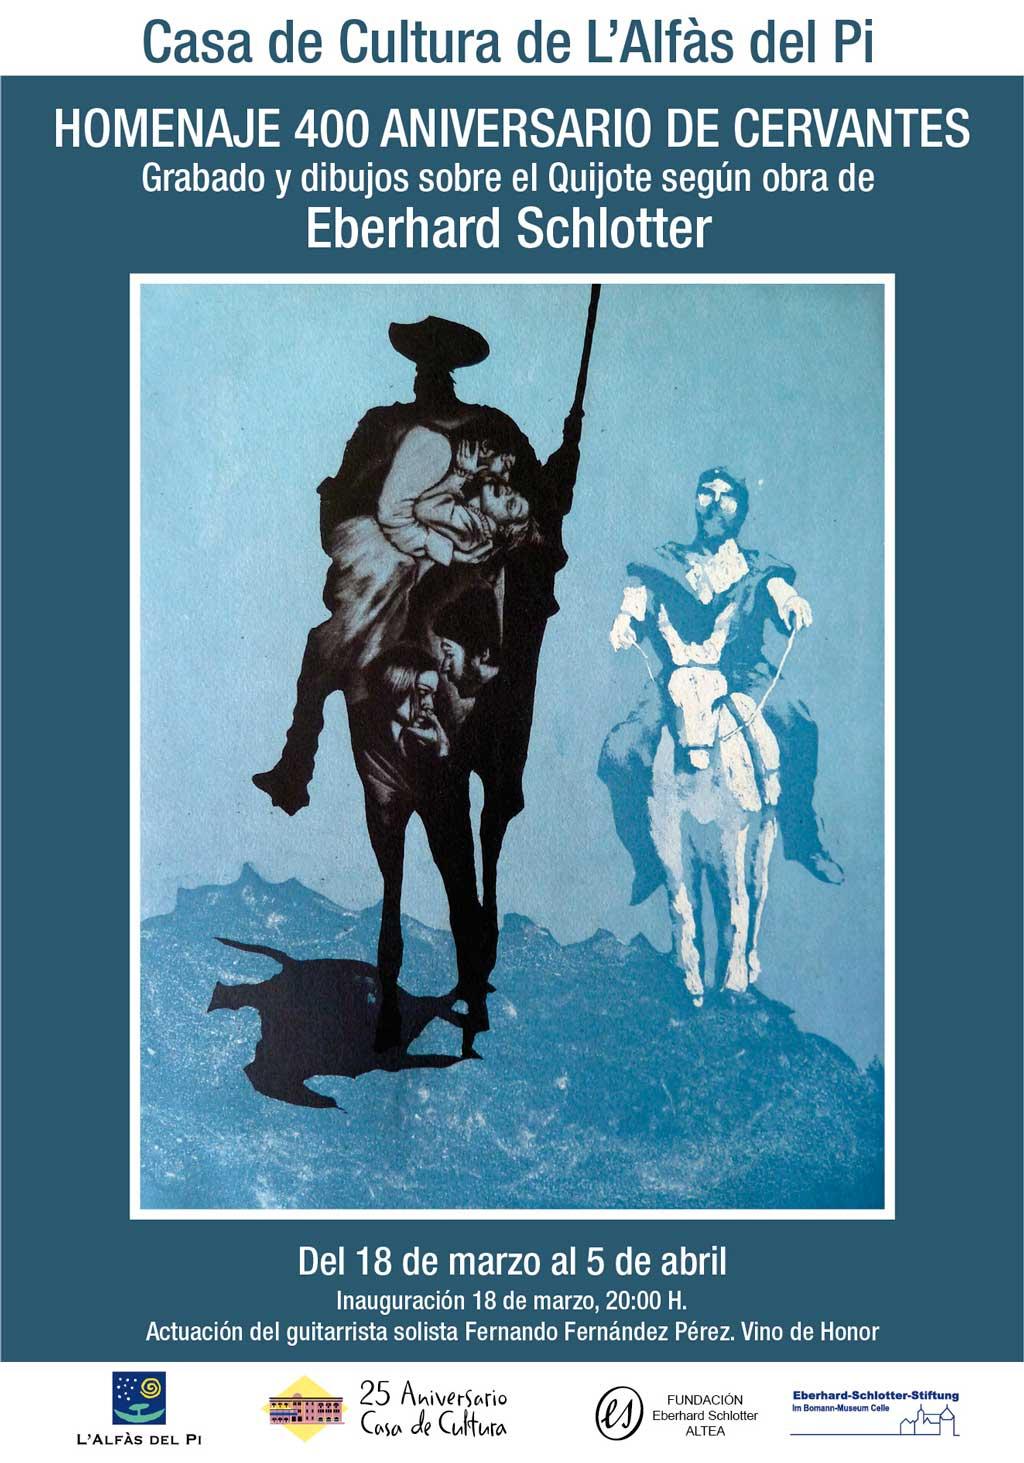 La Casa de Cultura de l'Alfàs acoge una exposición de grabados sobre Don Quijote de La Mancha a cargo de Eberhard Schlotter